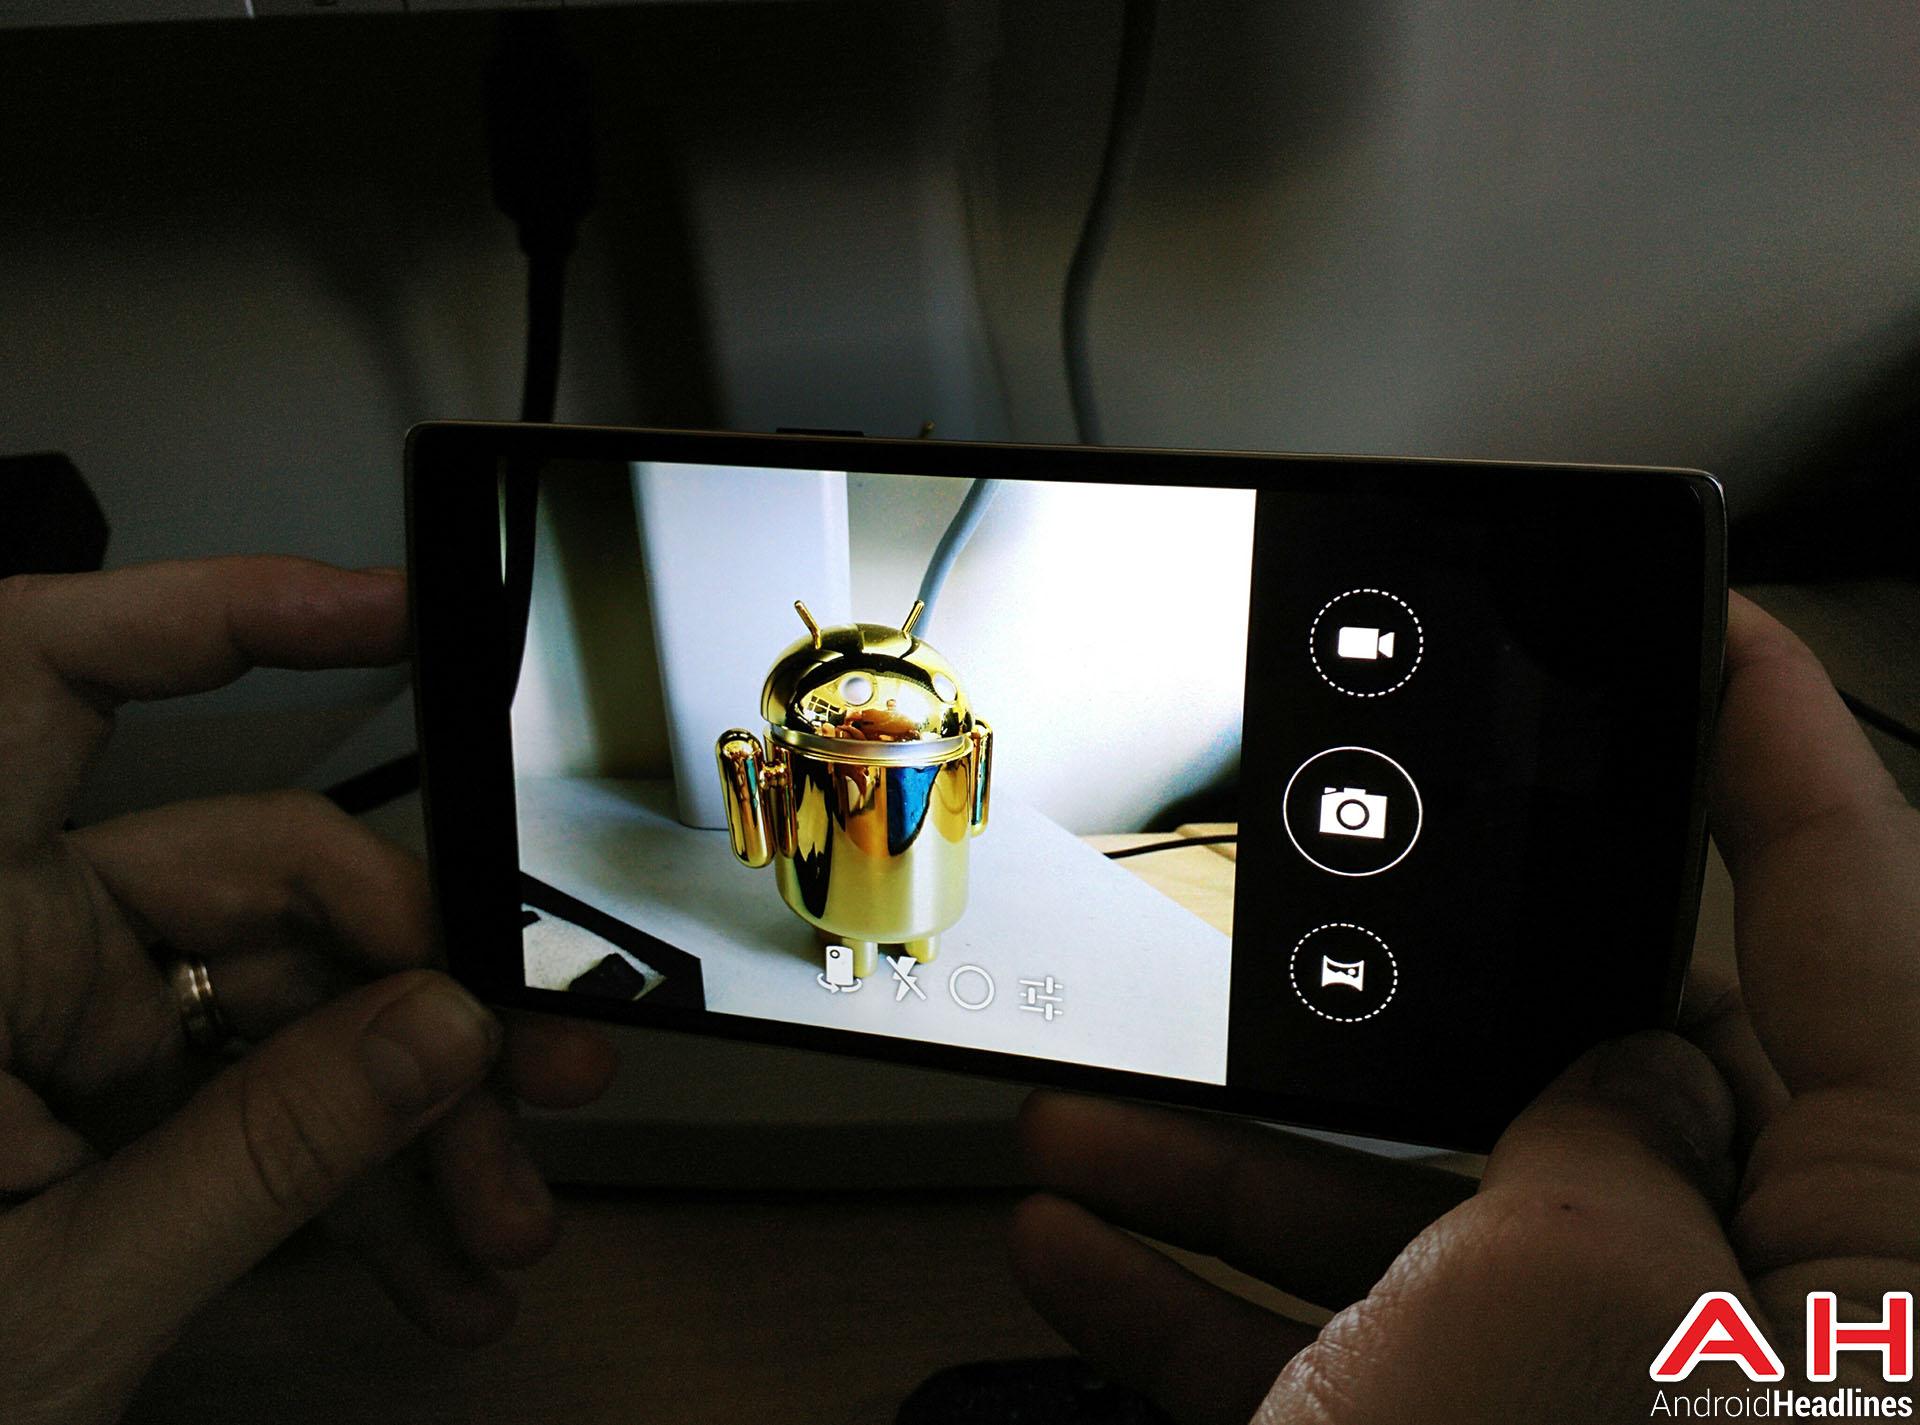 OnePlus-One-CameraNext-Mod-1